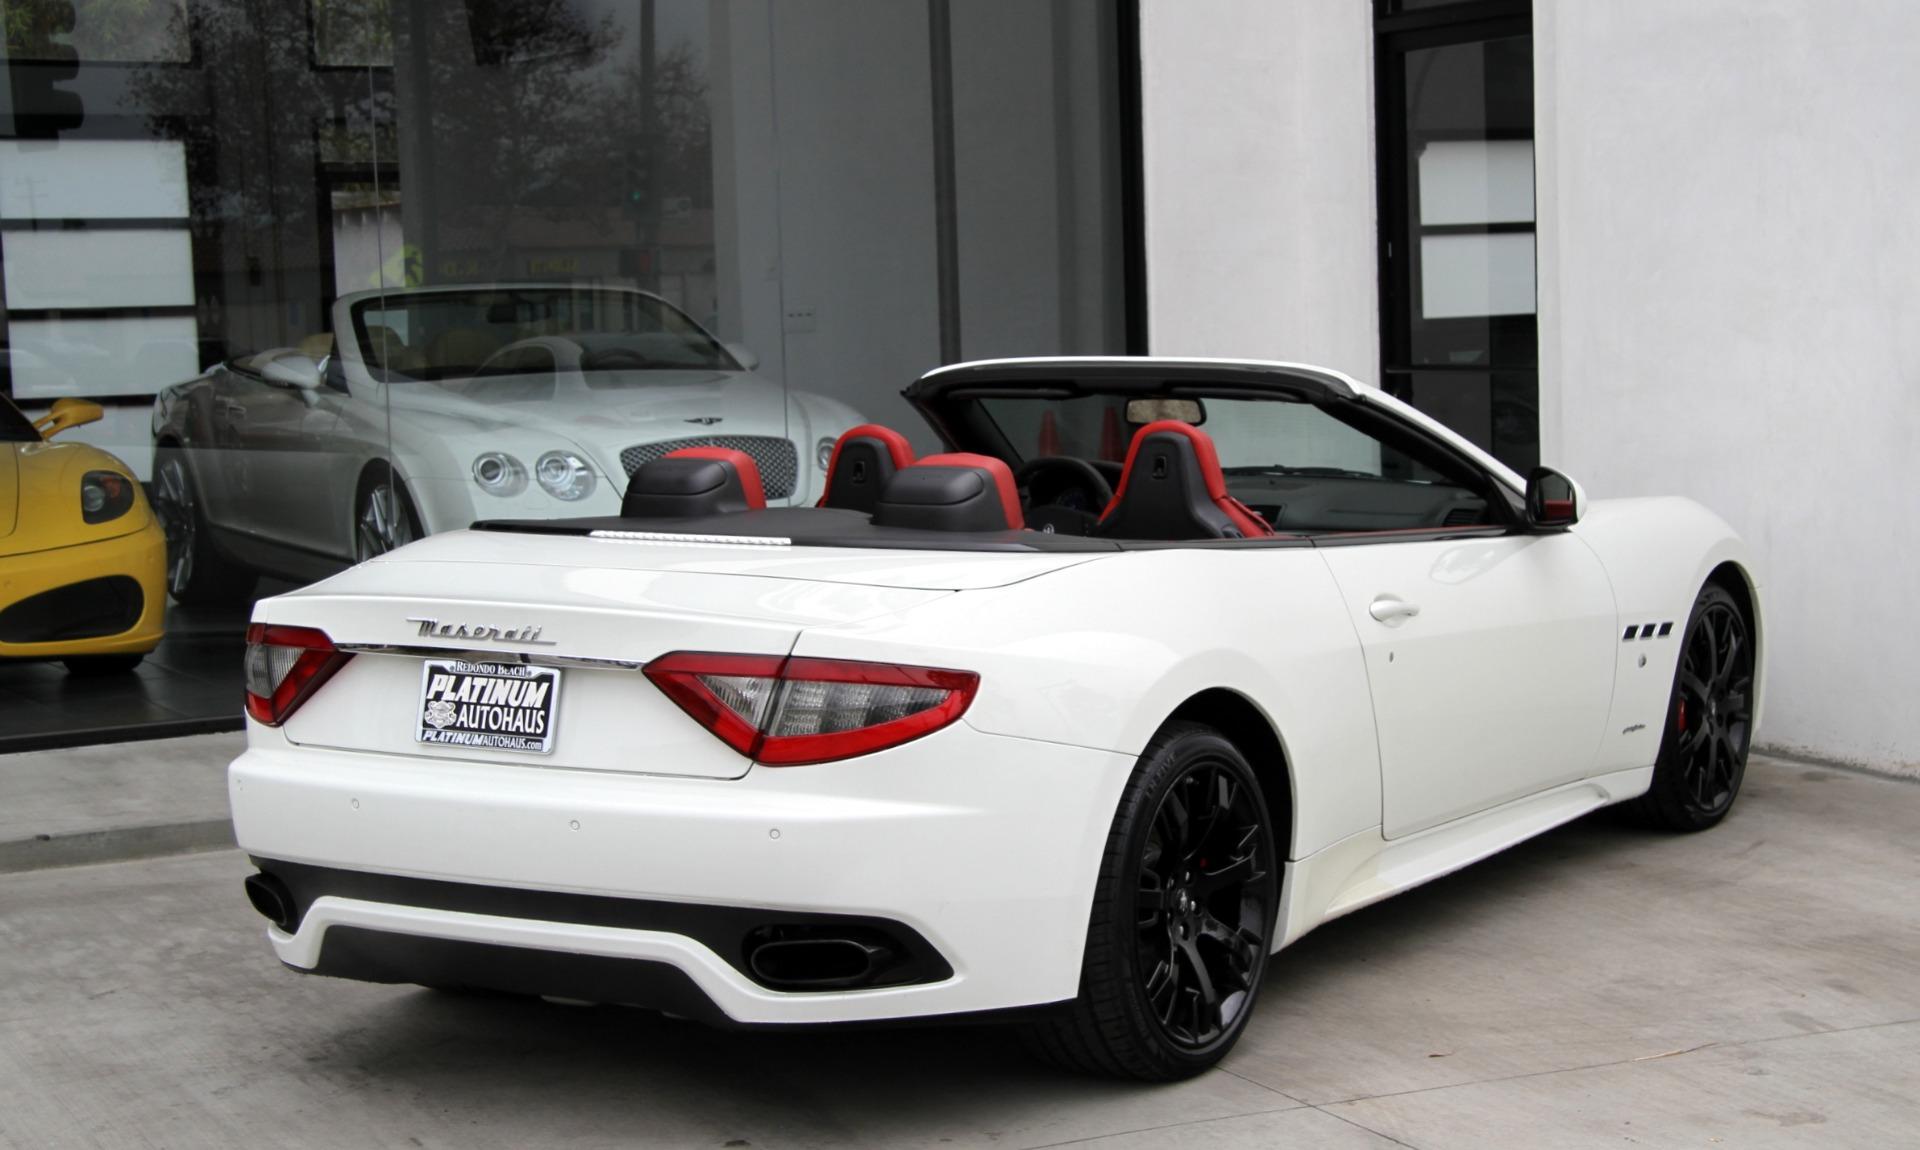 Dealer Near Me >> 2014 Maserati GranTurismo Sport Stock # 6130 for sale near Redondo Beach, CA | CA Maserati Dealer